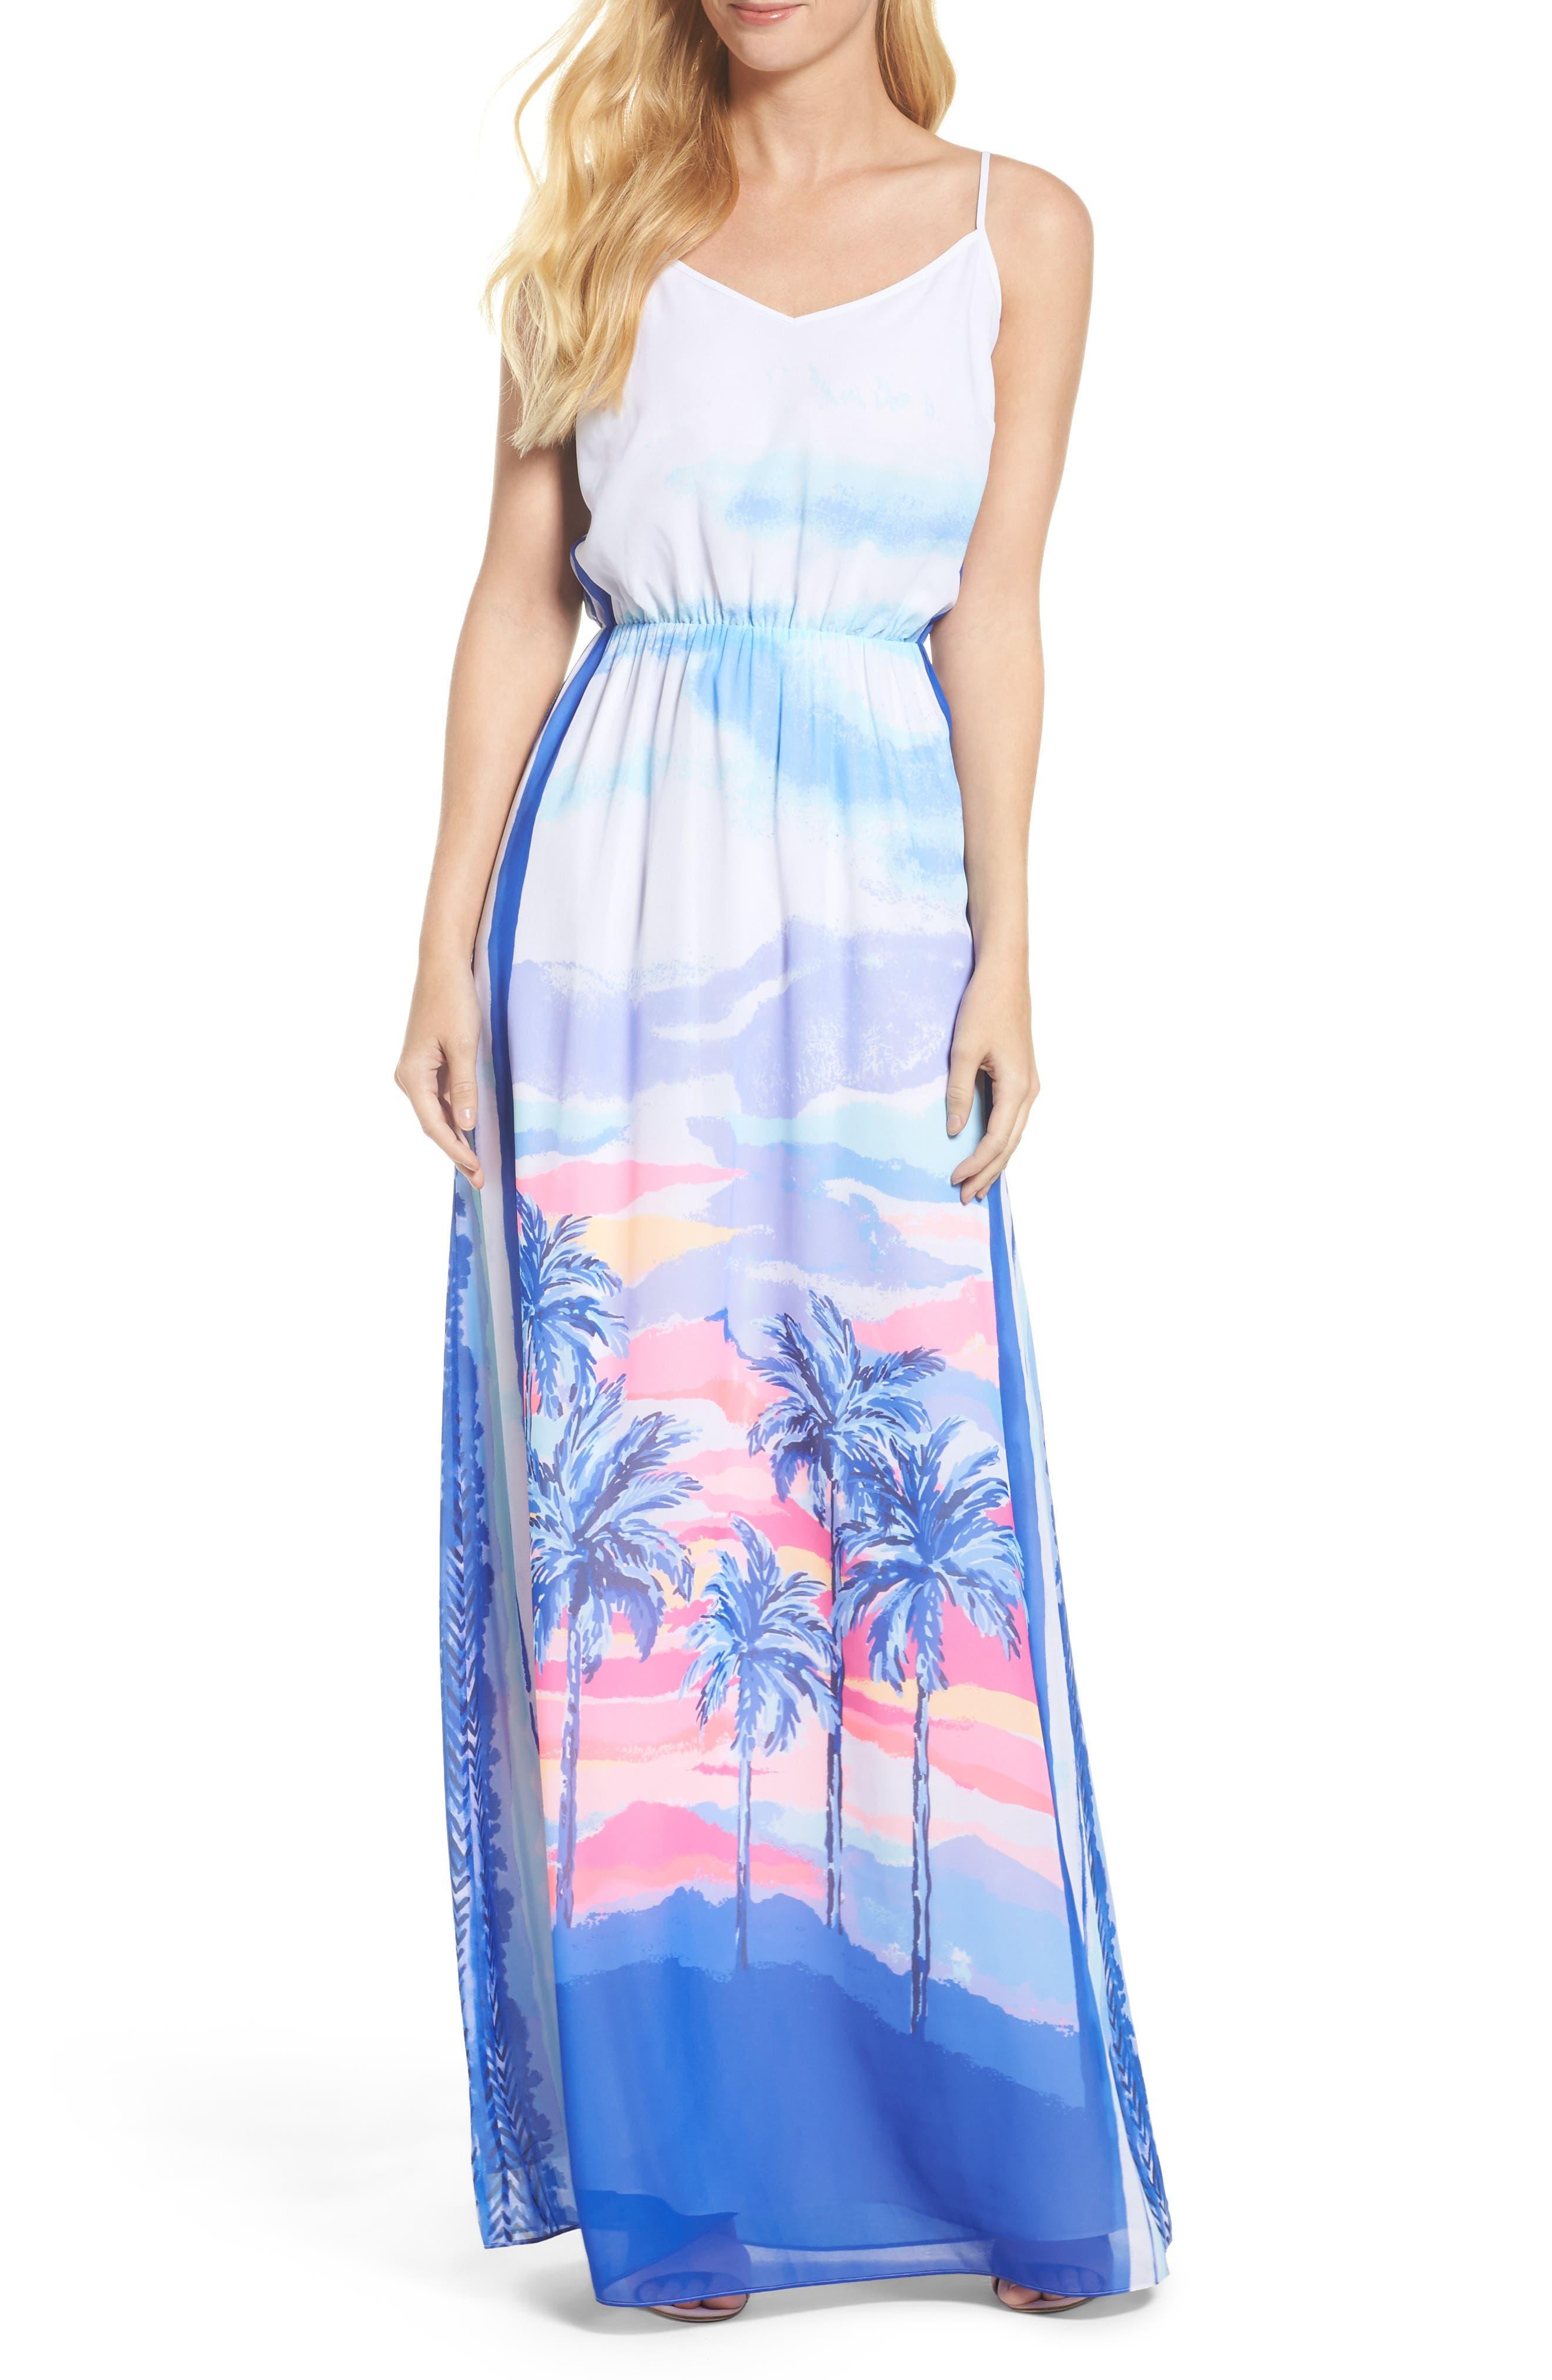 Deanna Maxi Dress,                             Alternate thumbnail 5, color,                             697